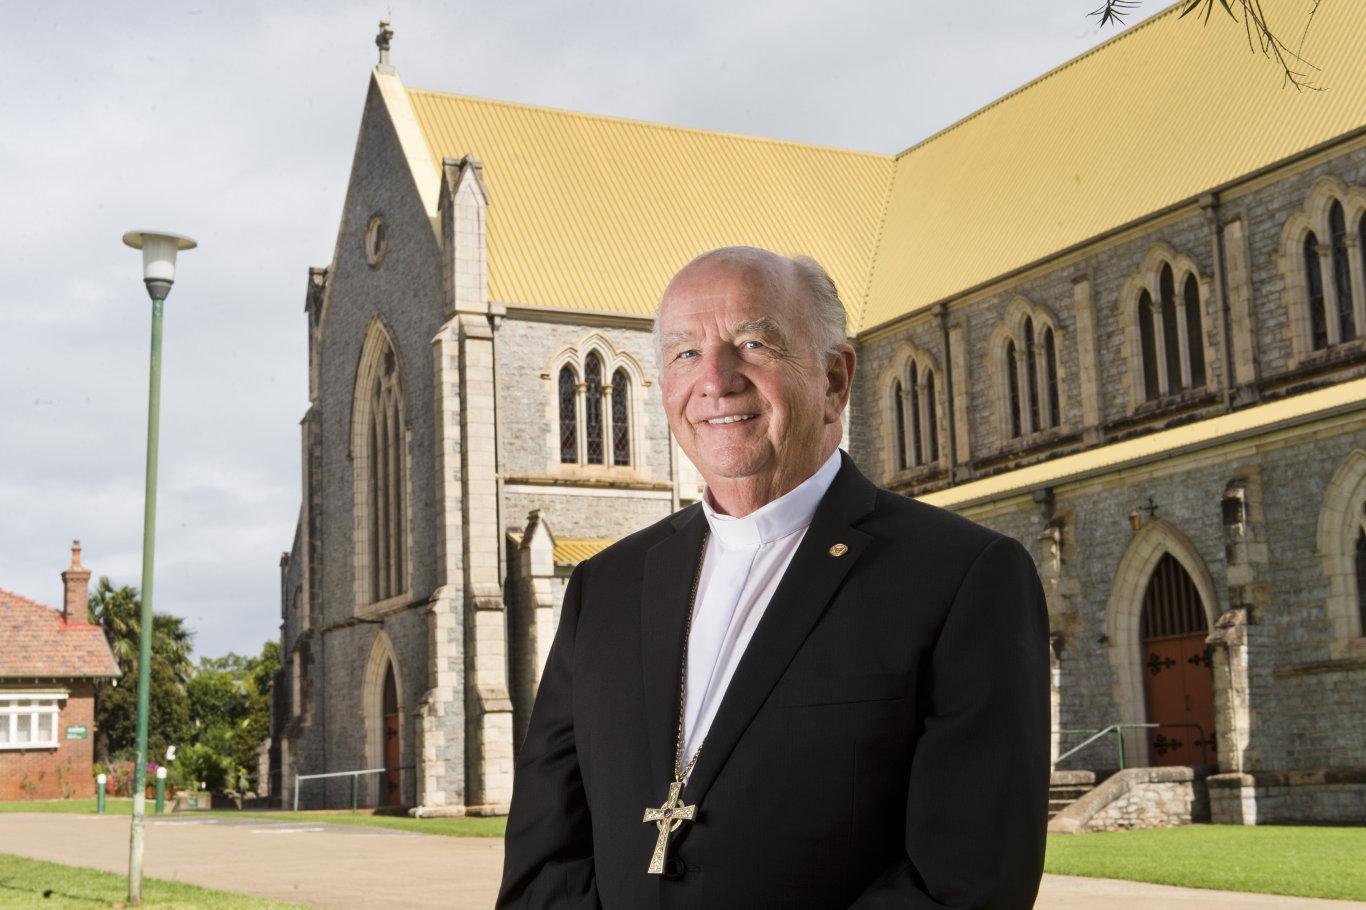 Bishop of the Toowoomba Catholic Diocese Bishop Robert McGuckin